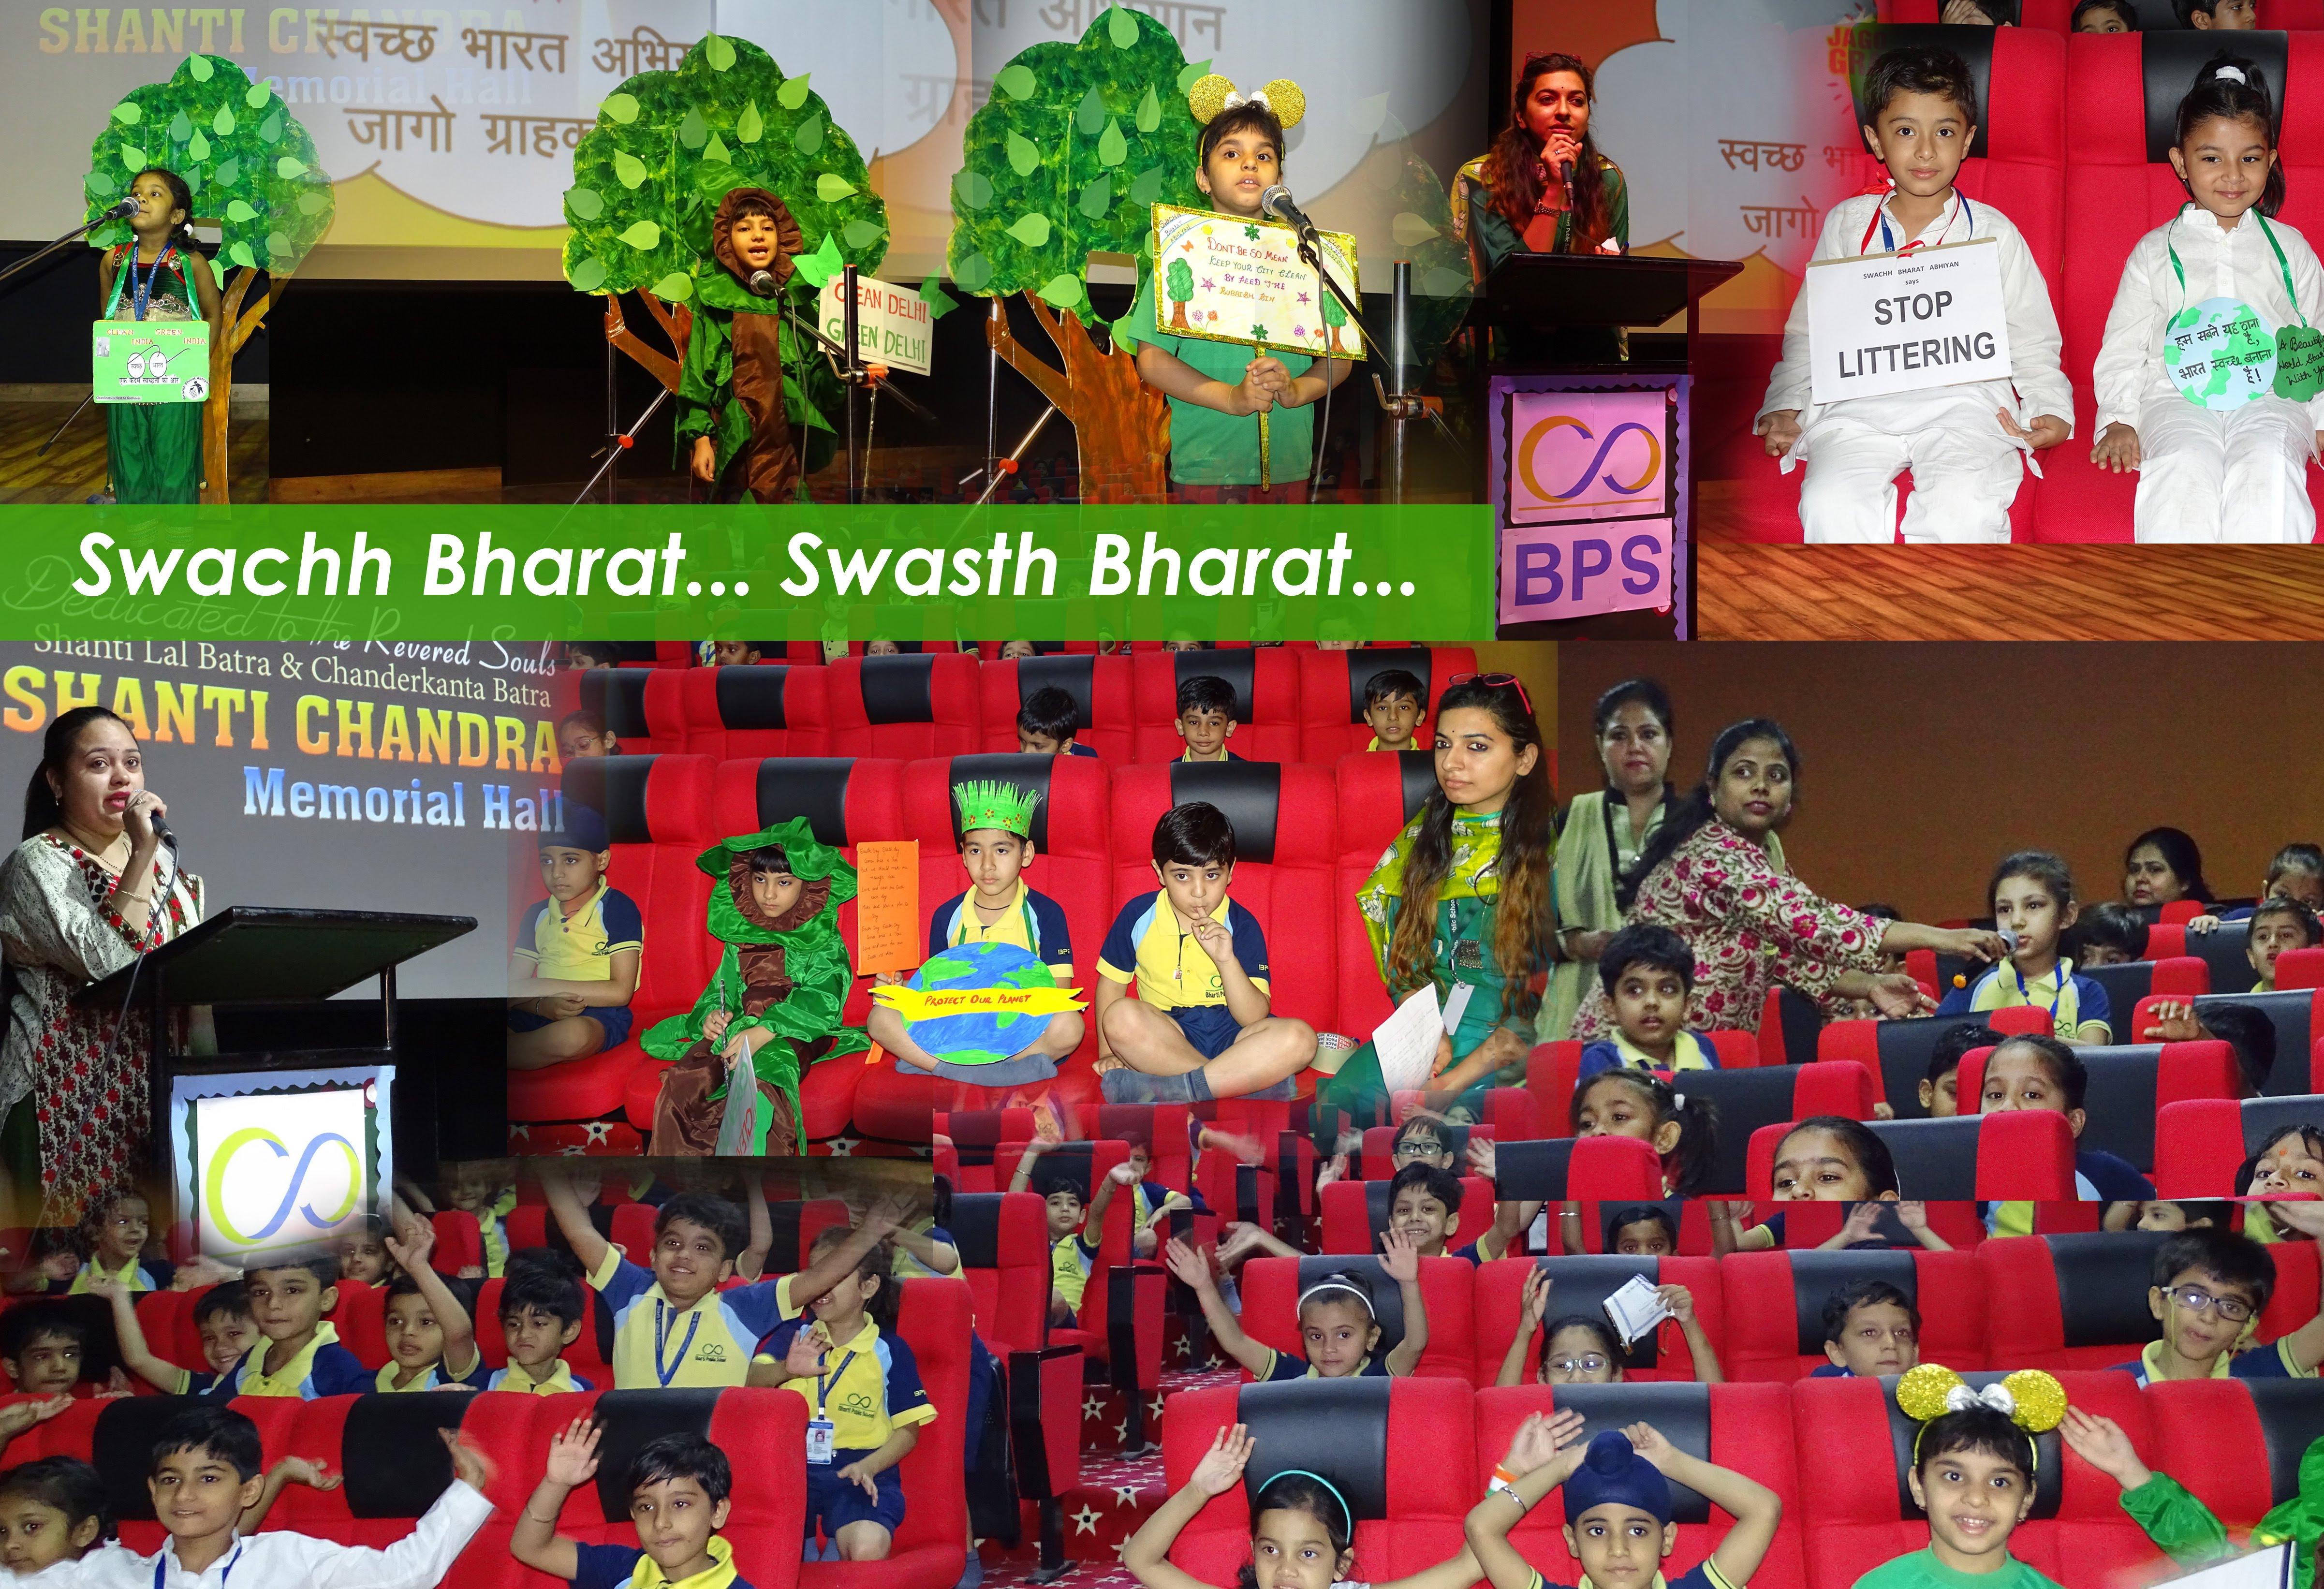 Swachh Bharat... Swasth Bharat...